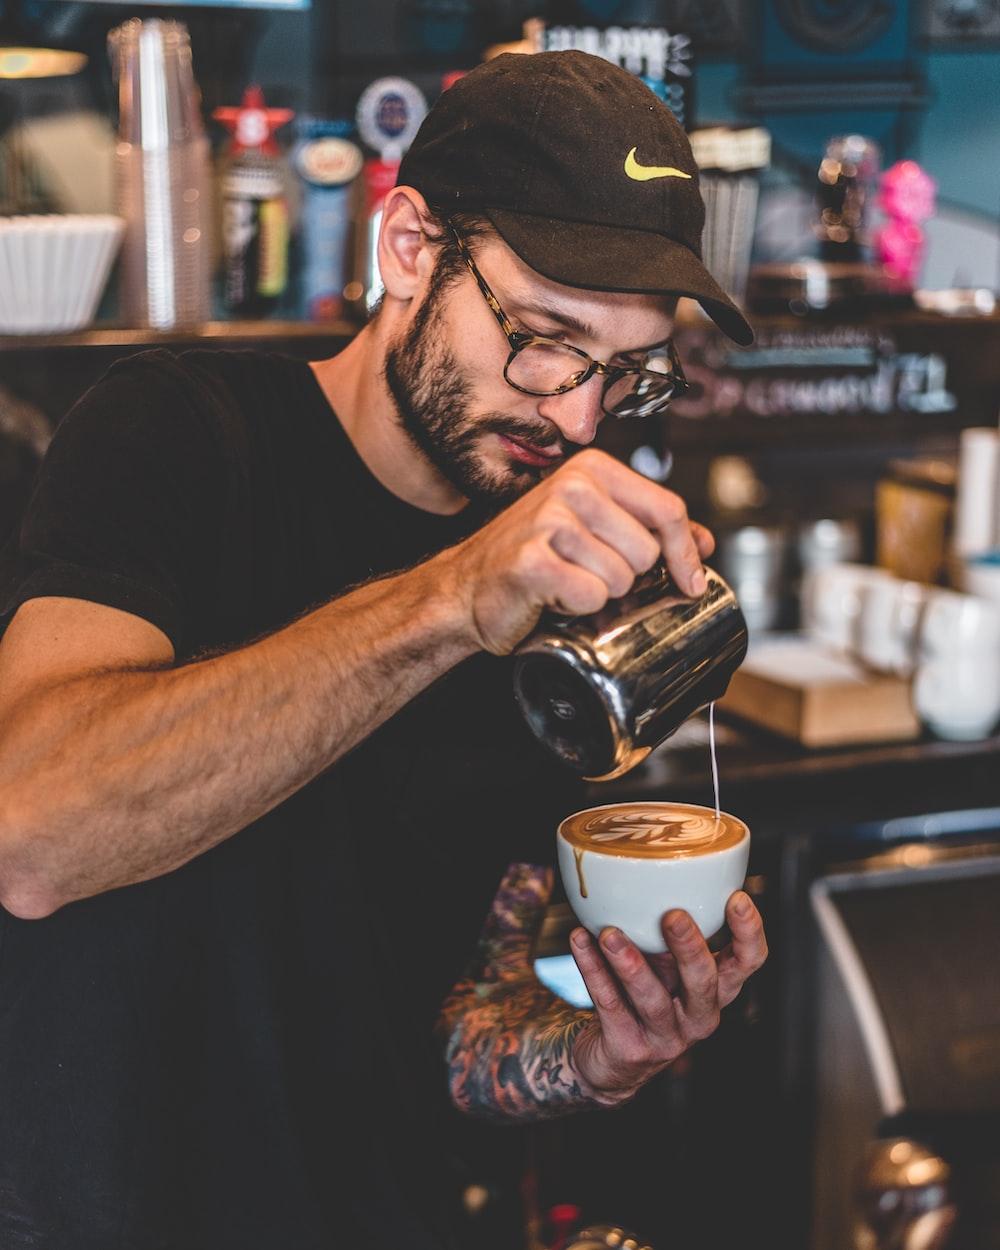 man in black shirt pouring milk on latte